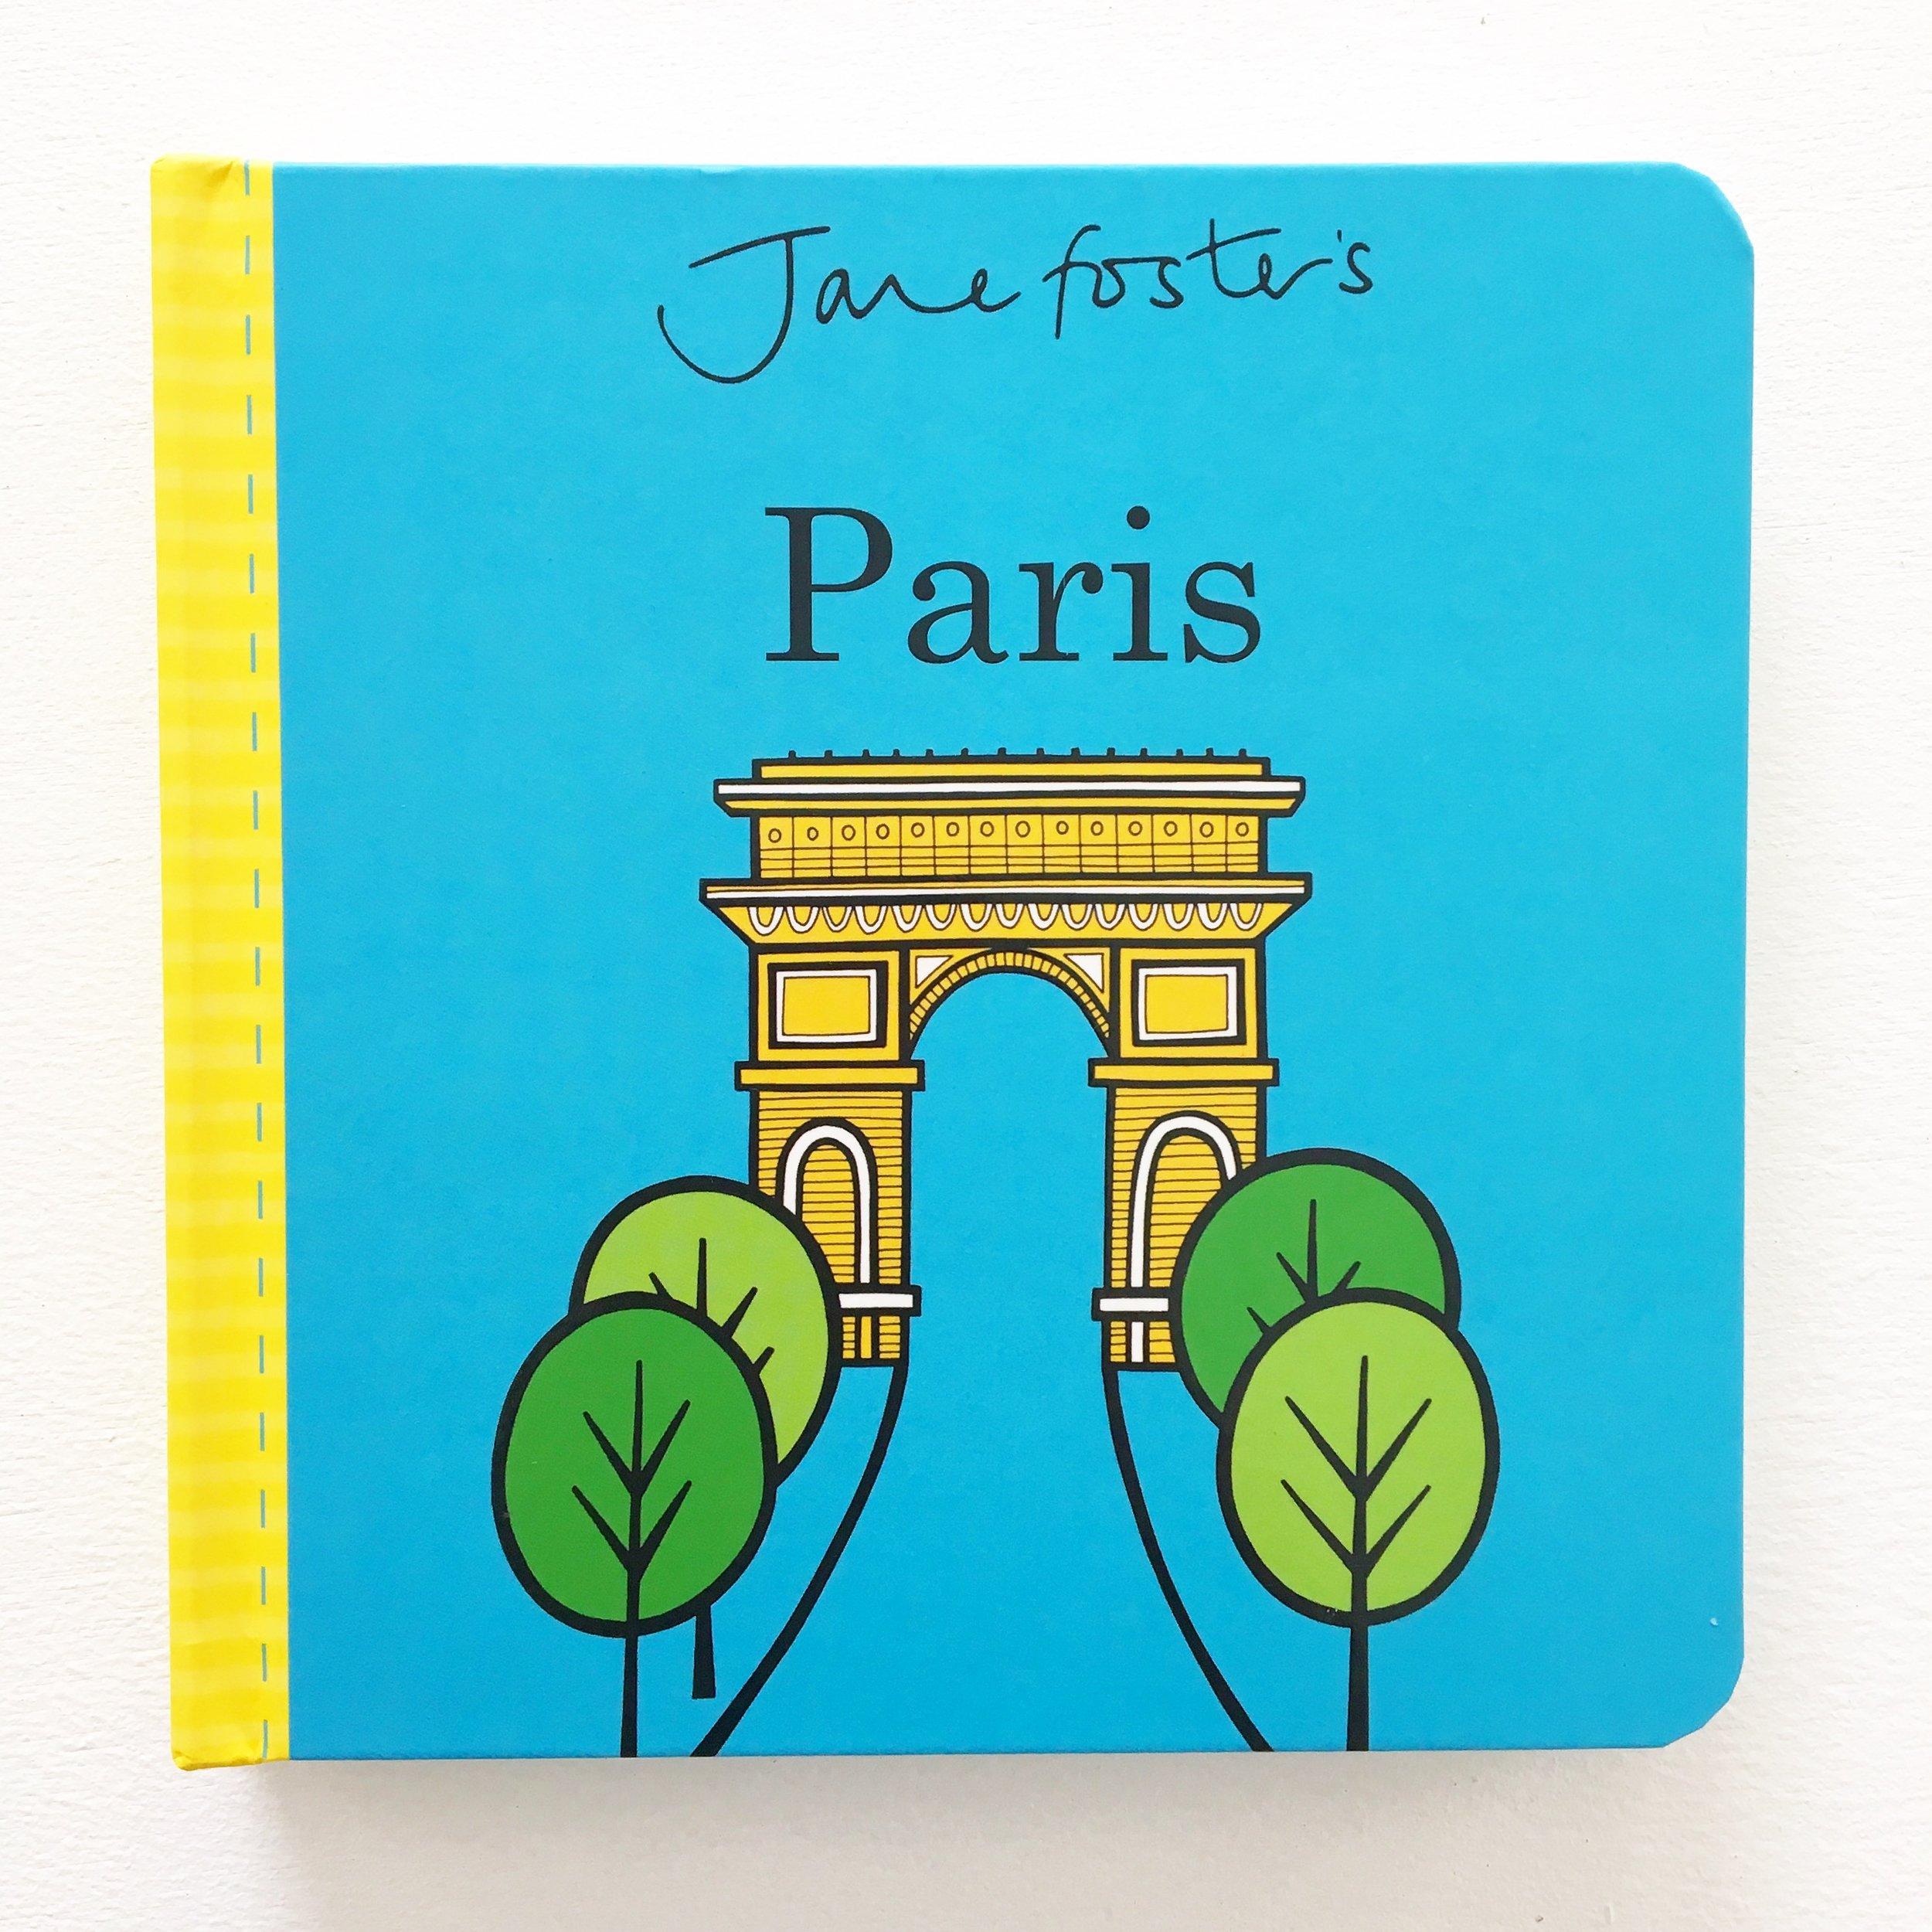 Jane Foster's Paris